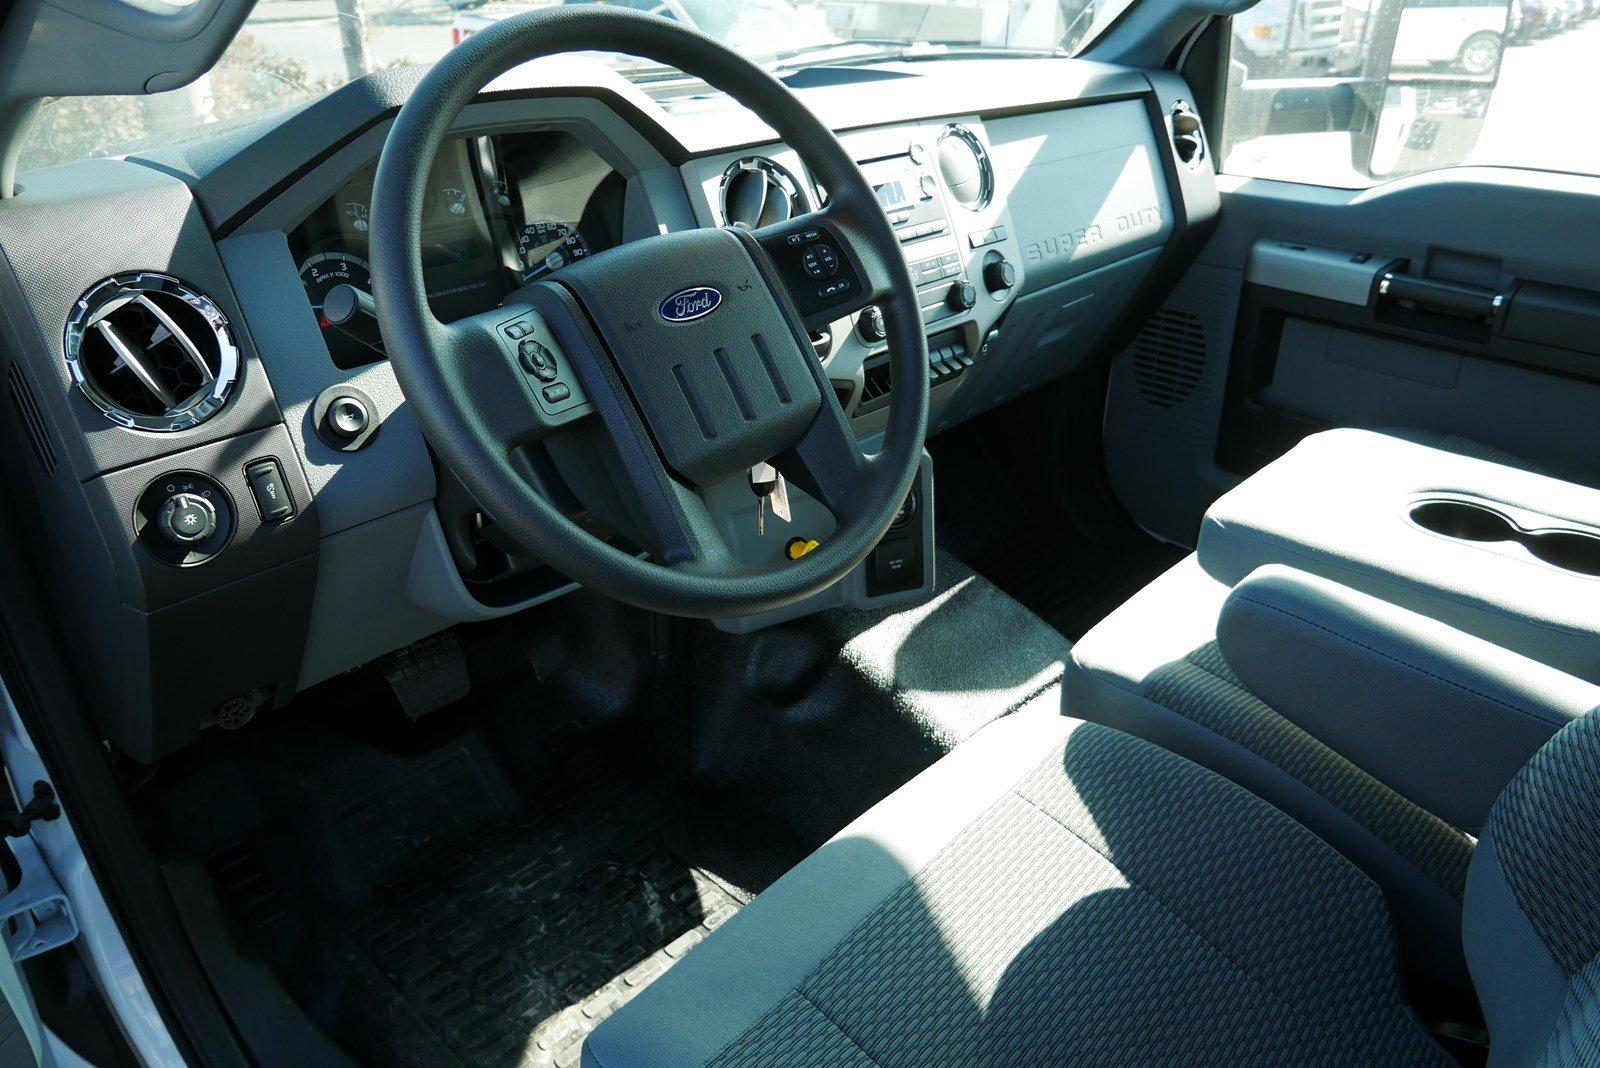 2019 F-750 Regular Cab DRW 4x2, Cab Chassis #69293 - photo 12